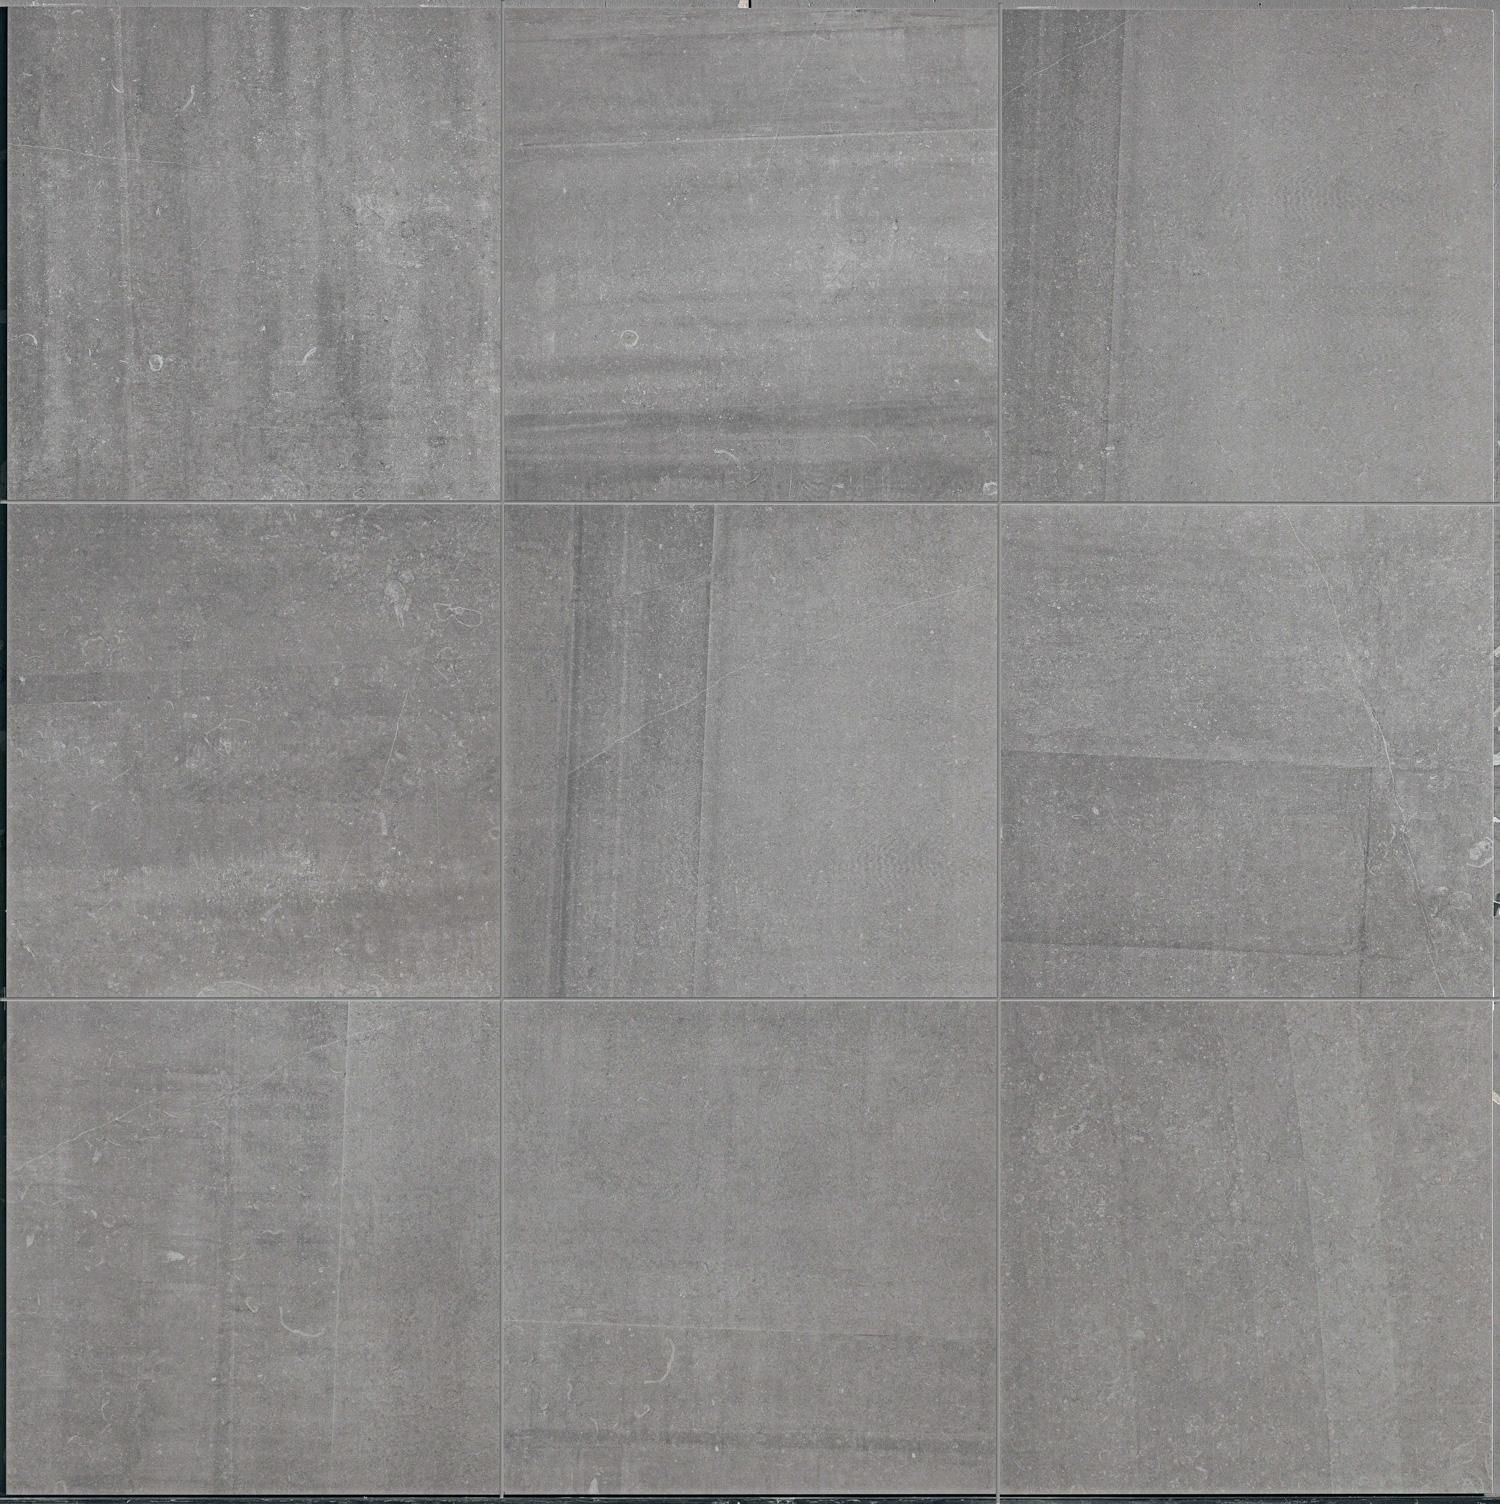 Keope back grey matt 15x15 cm megakakel sverige ab for R f bathrooms and kitchens